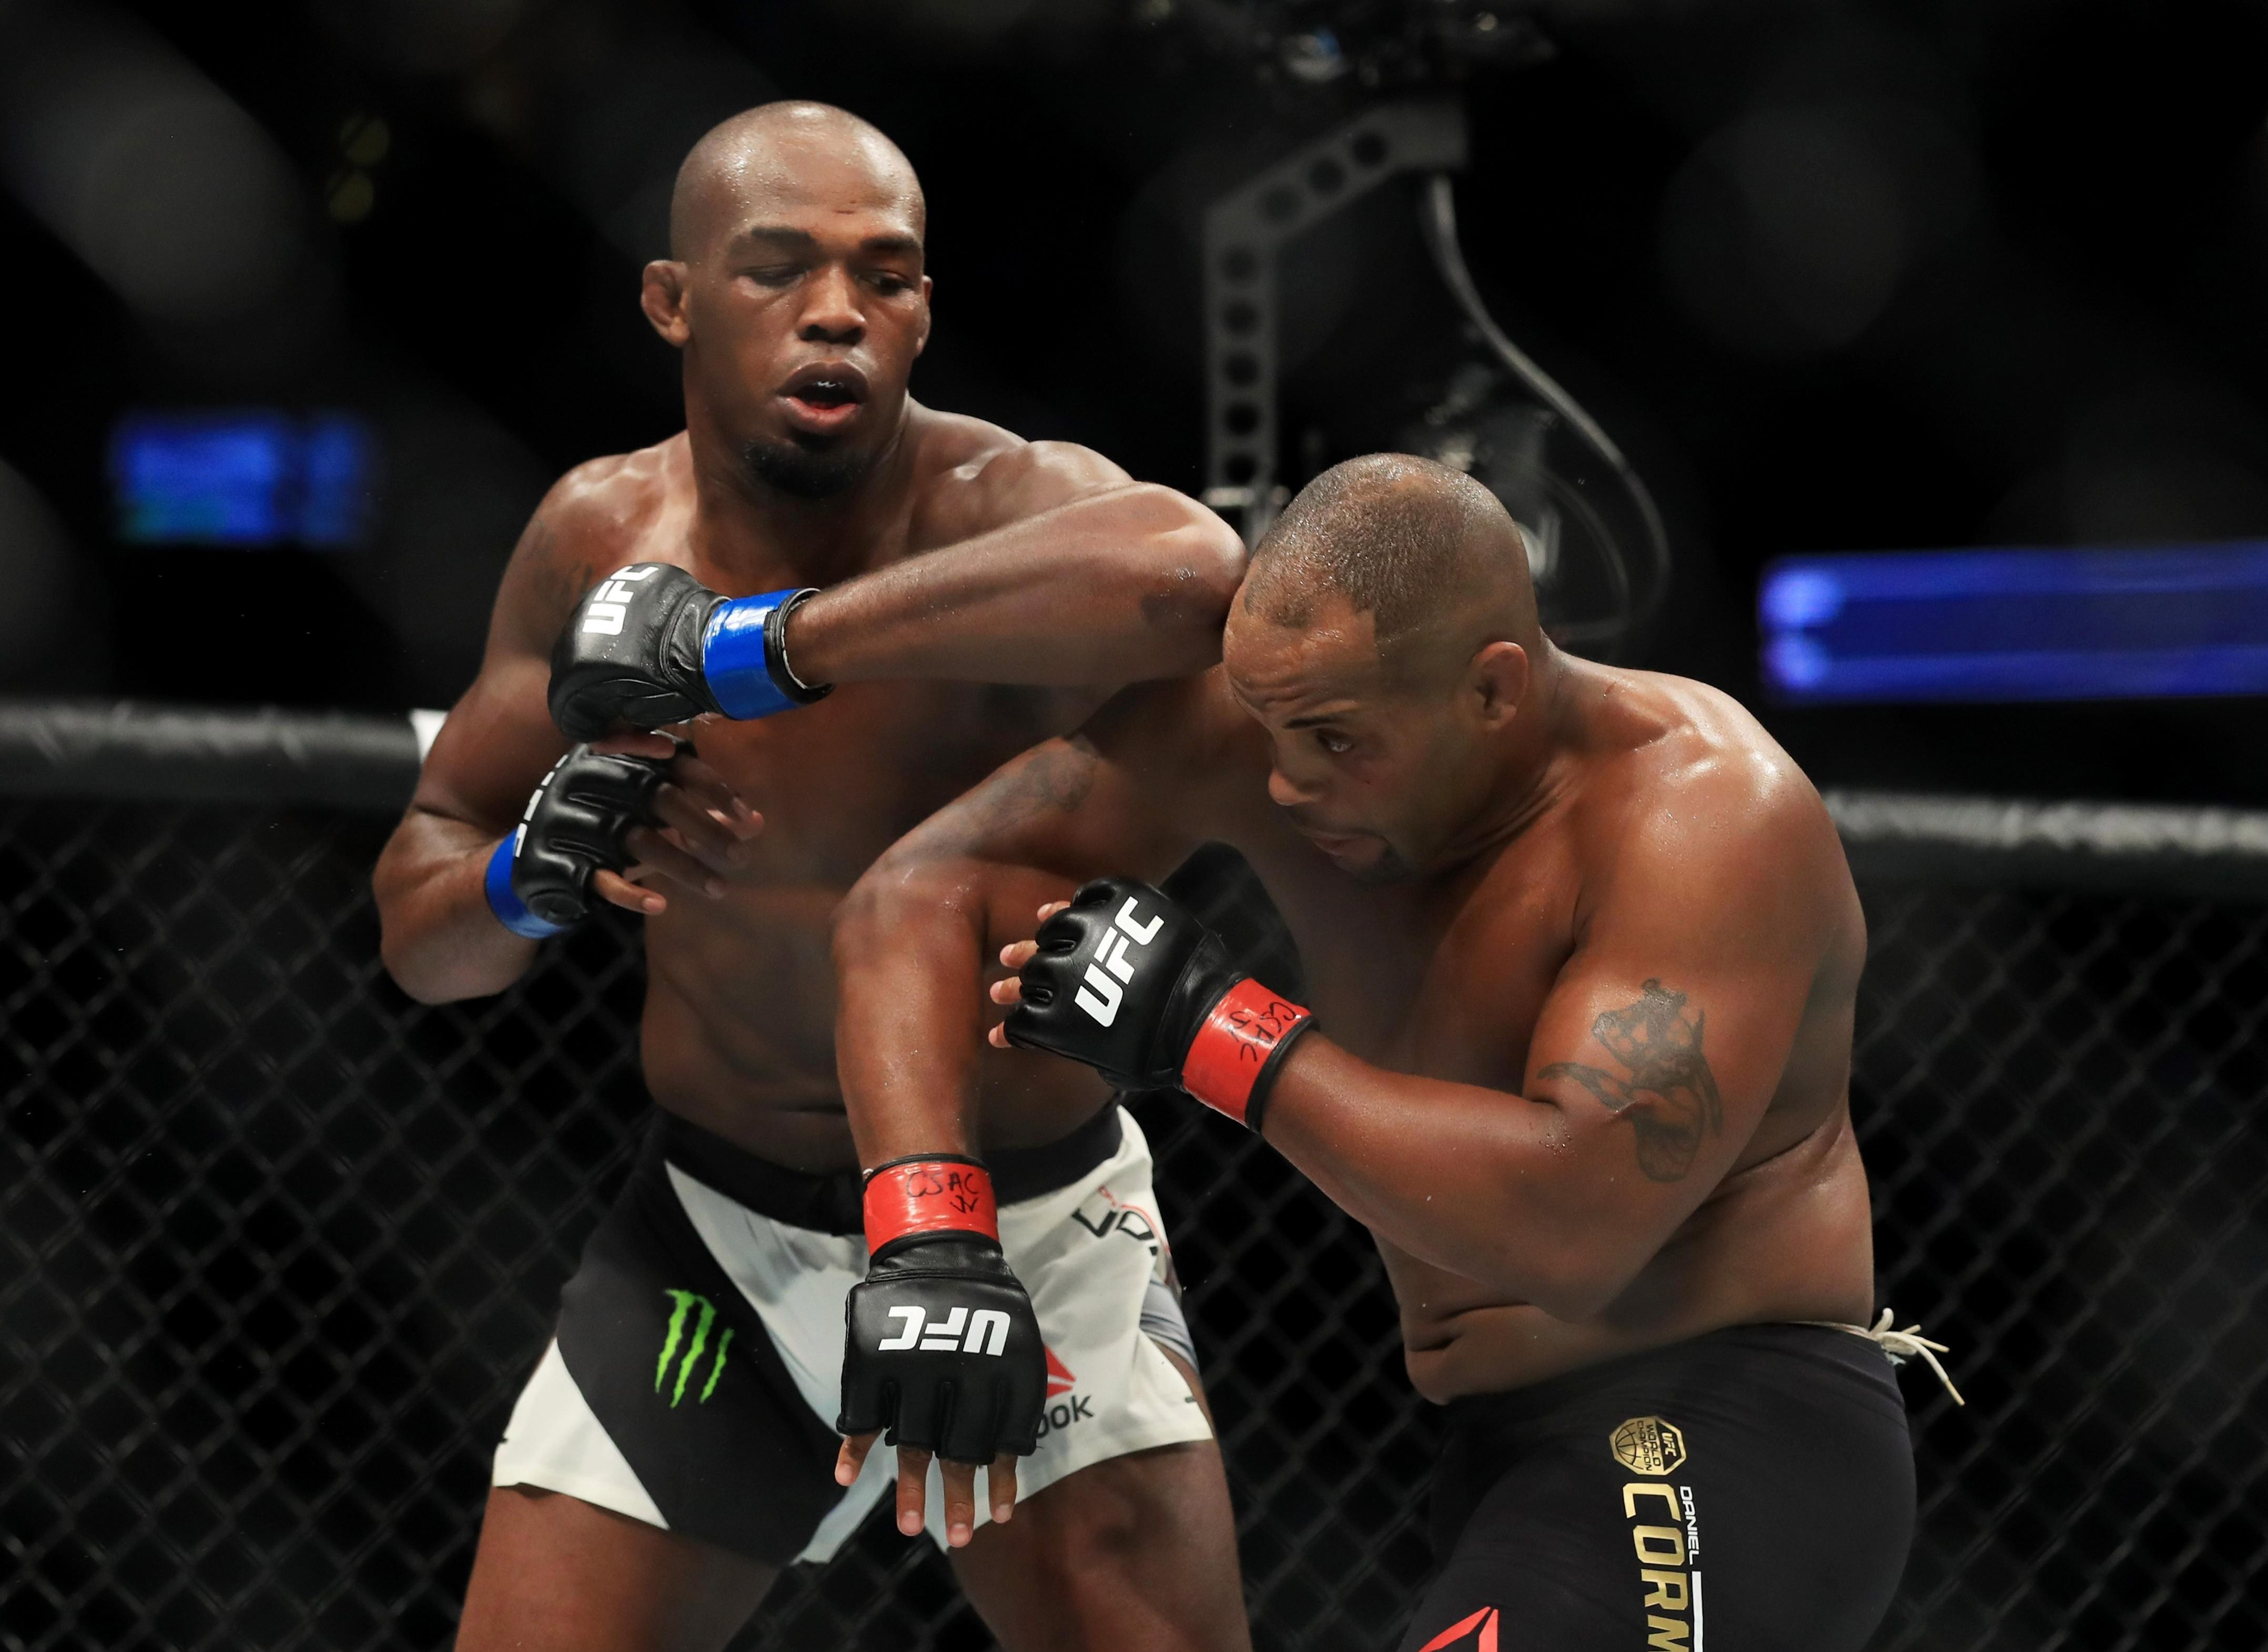 Jones have fought Cormier twice